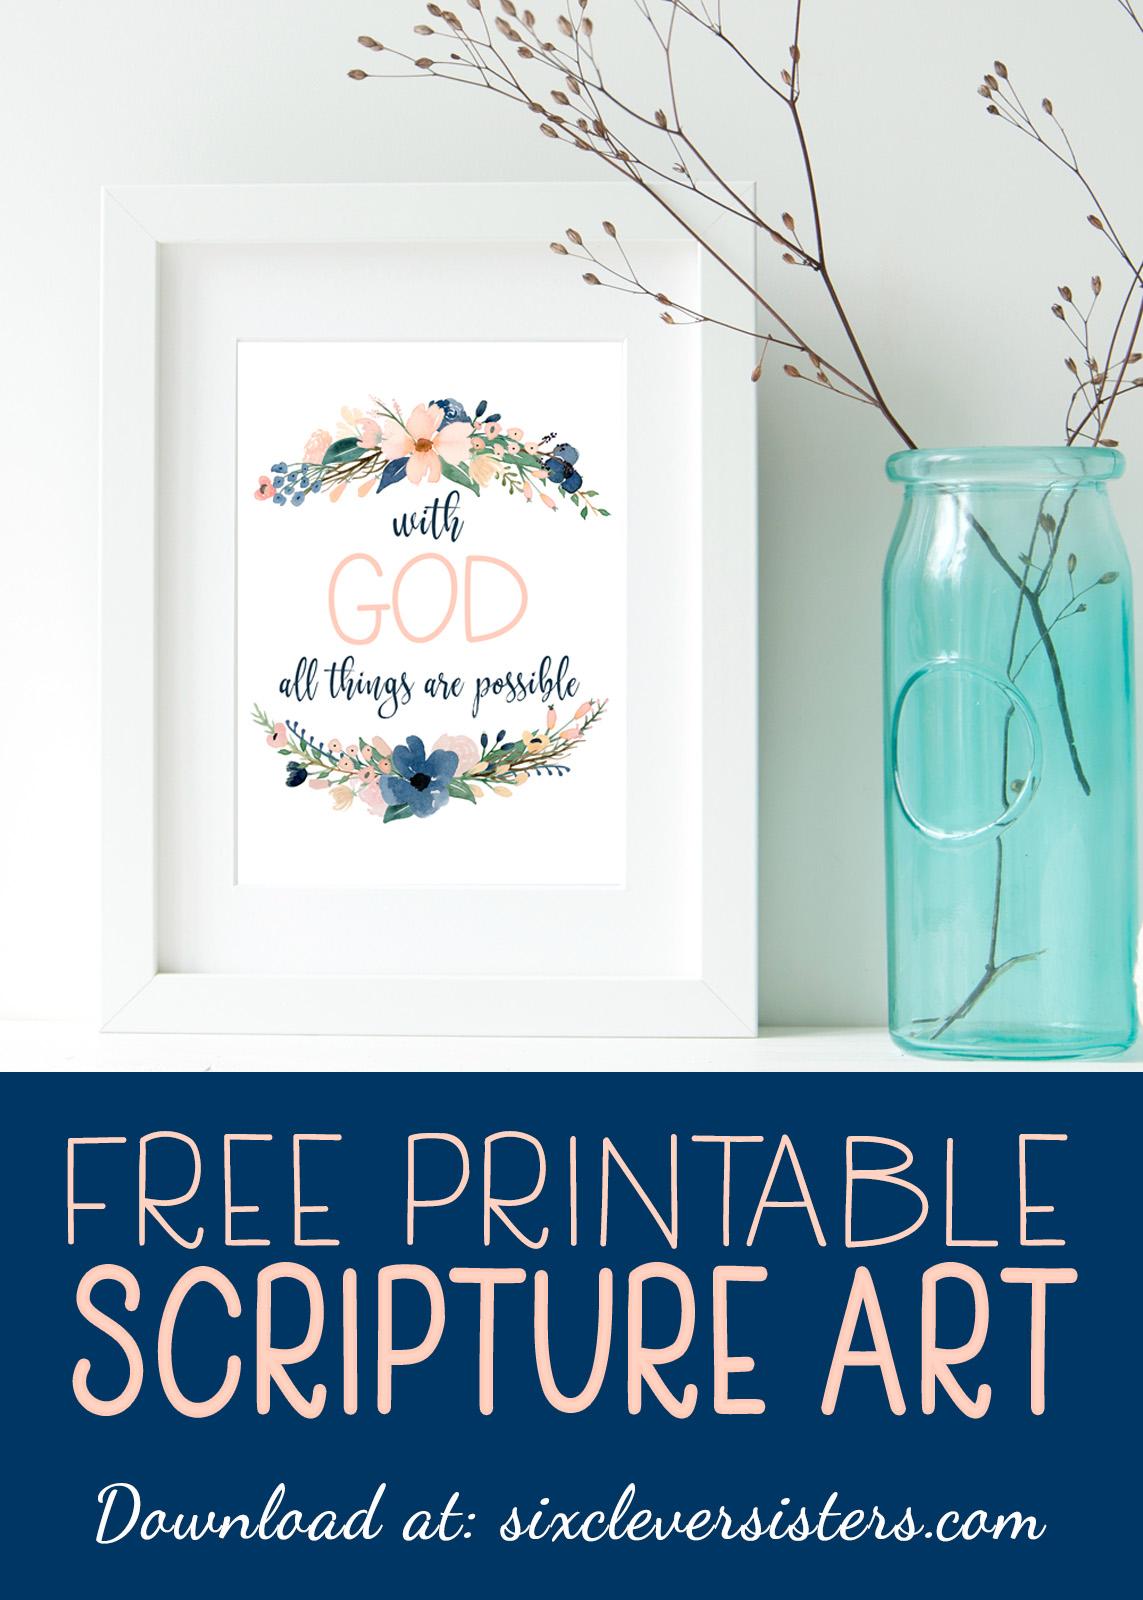 picture regarding Free Printable Scripture Art known as Cost-free Printable Scripture Artwork: With God - 6 Intelligent Sisters